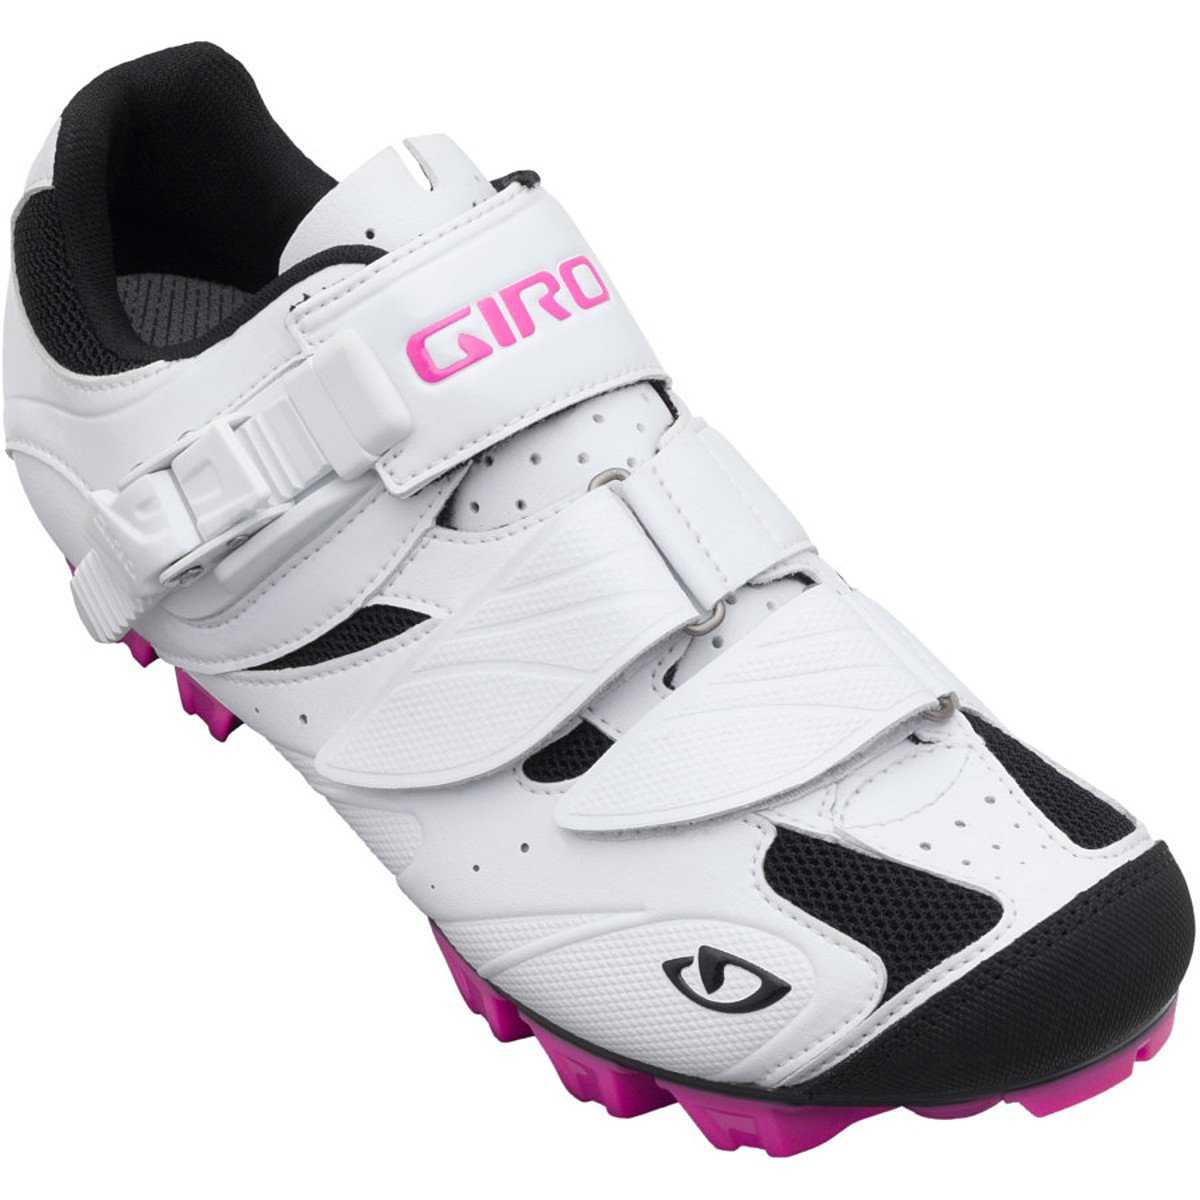 Giro Manta Damen MTB Schuhe weiß rot 2014  Größe  38.5